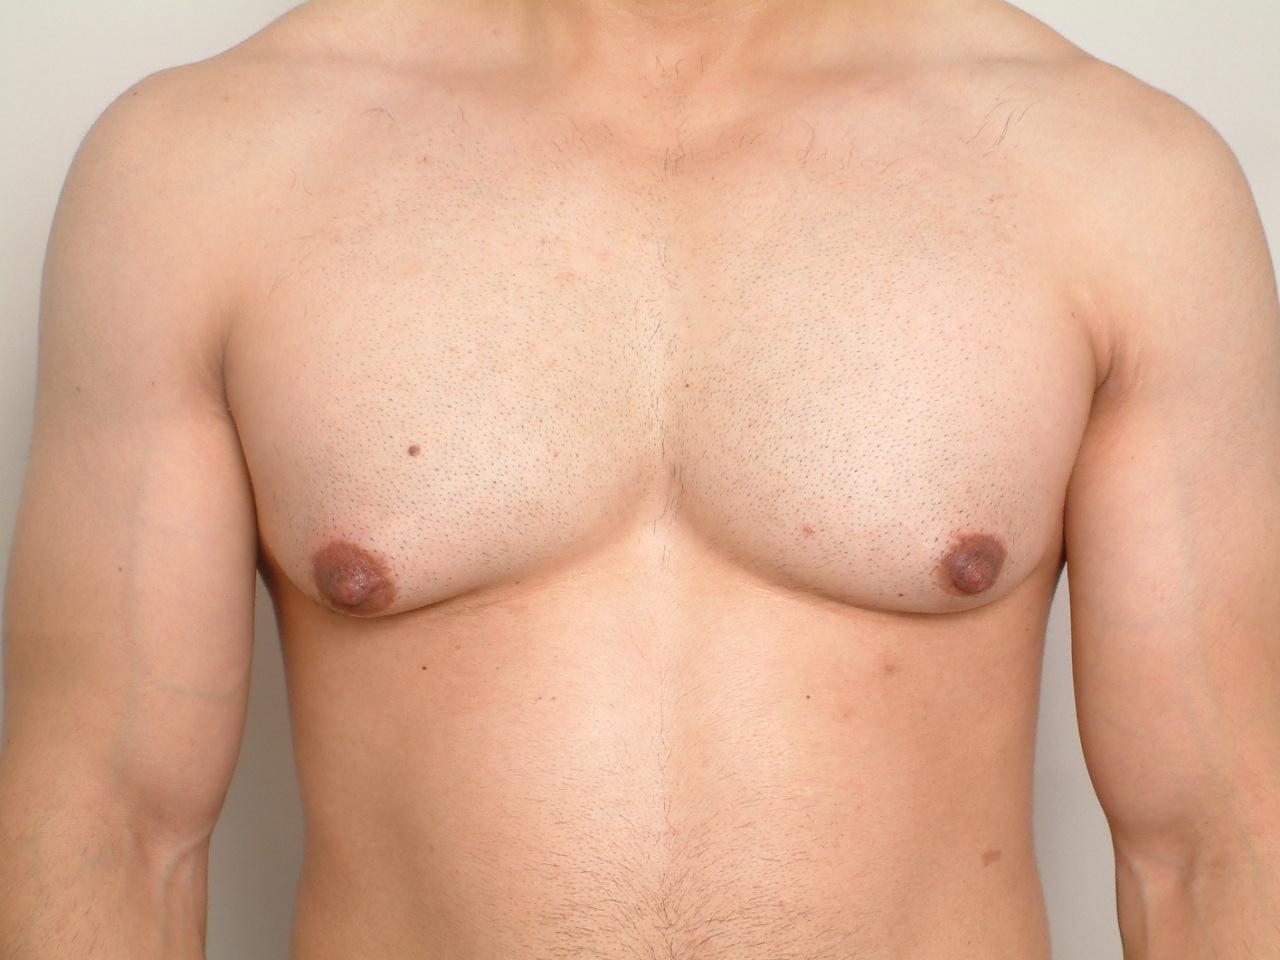 male gynecomastia, Gynecomastia